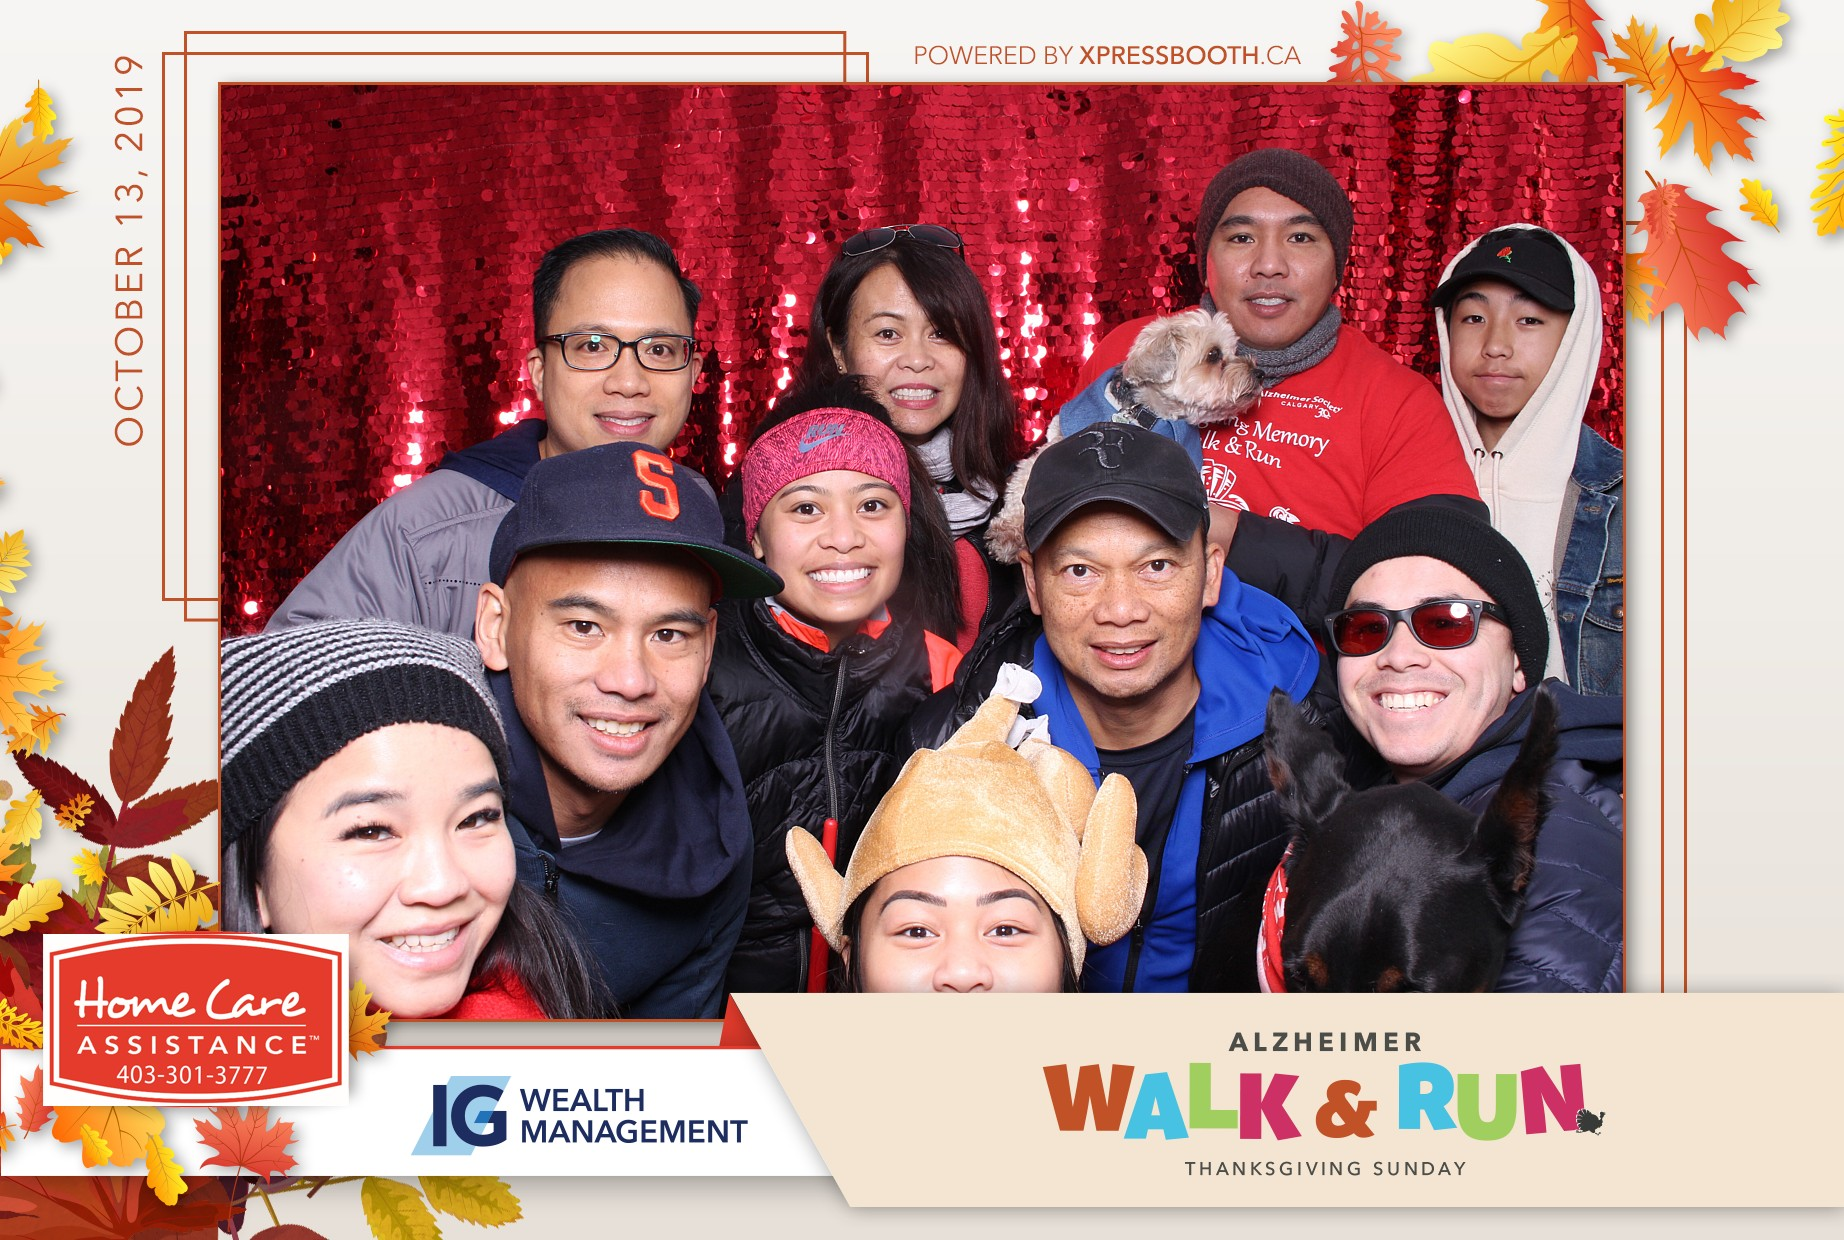 WalkRunAlzheimerSociety-0218-PRINT